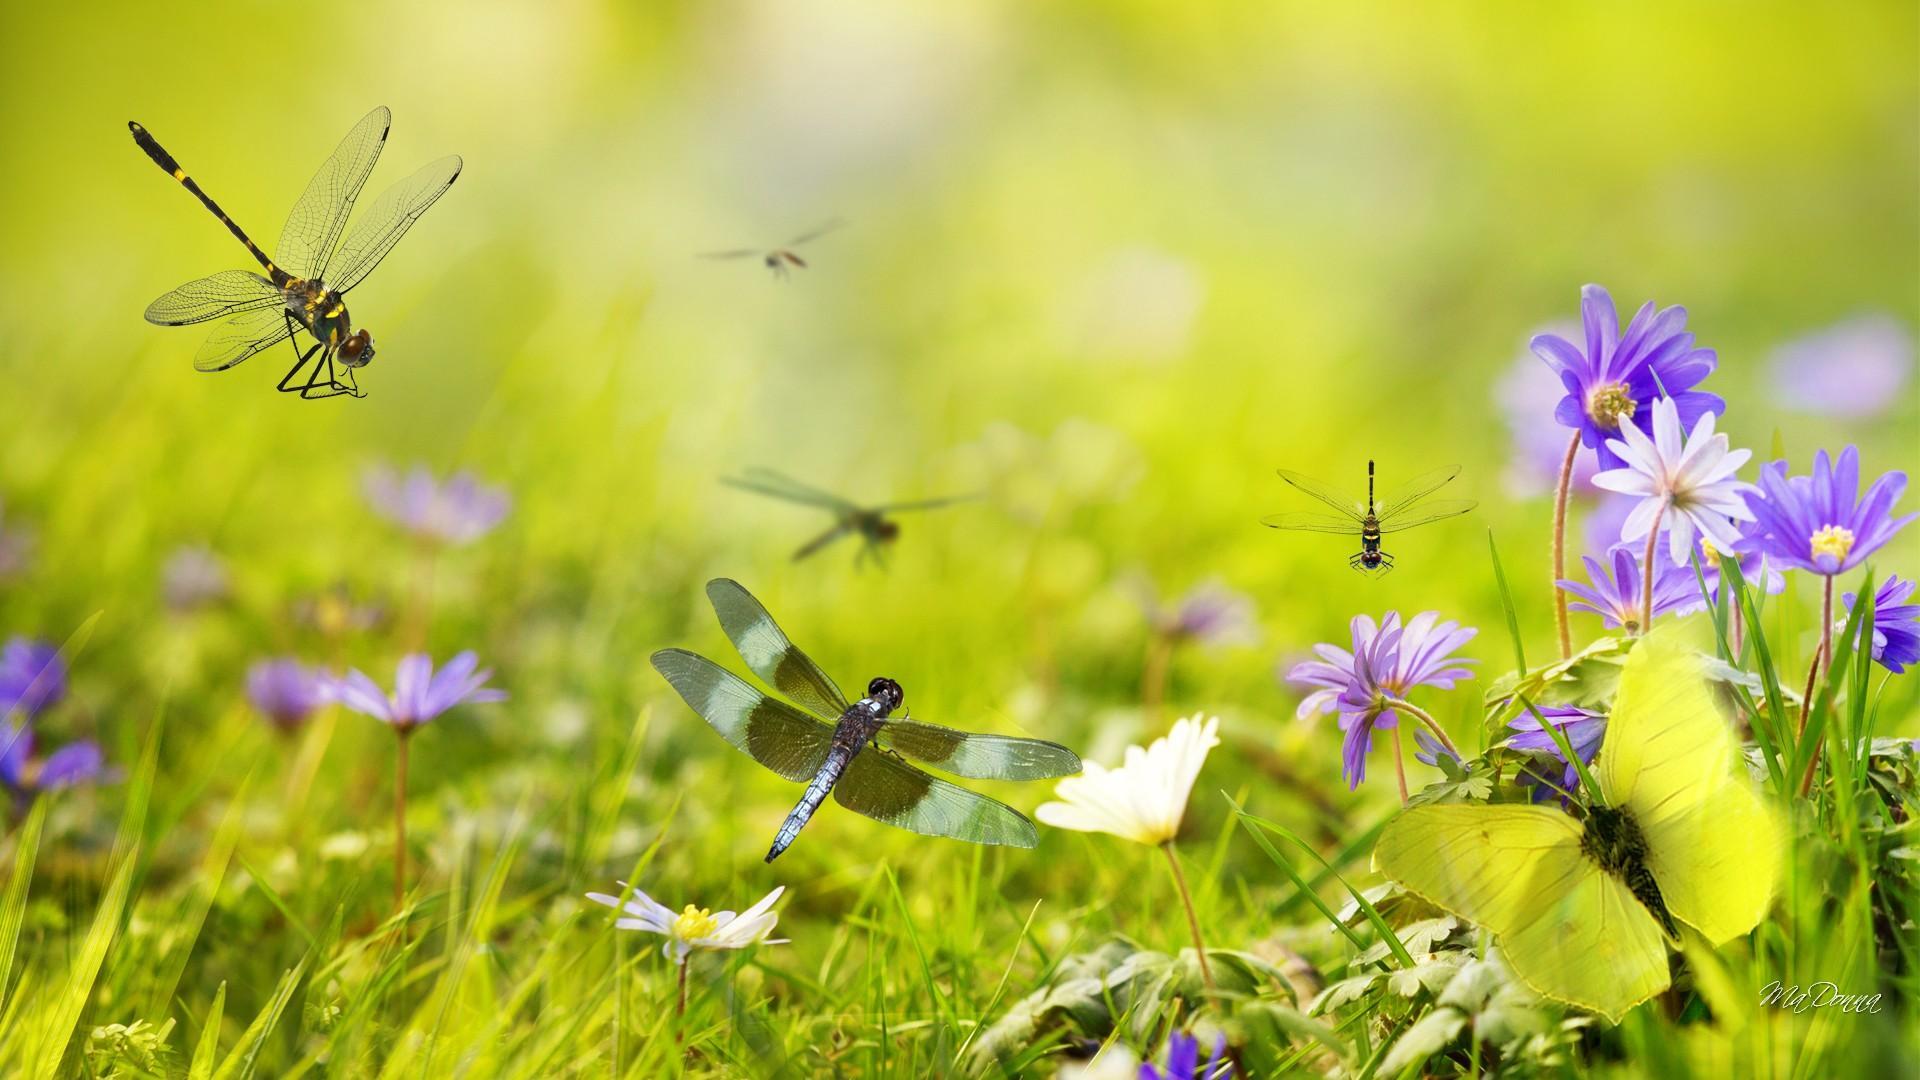 Dragonflies in the garden HQ WALLPAPER   98391 1920x1080